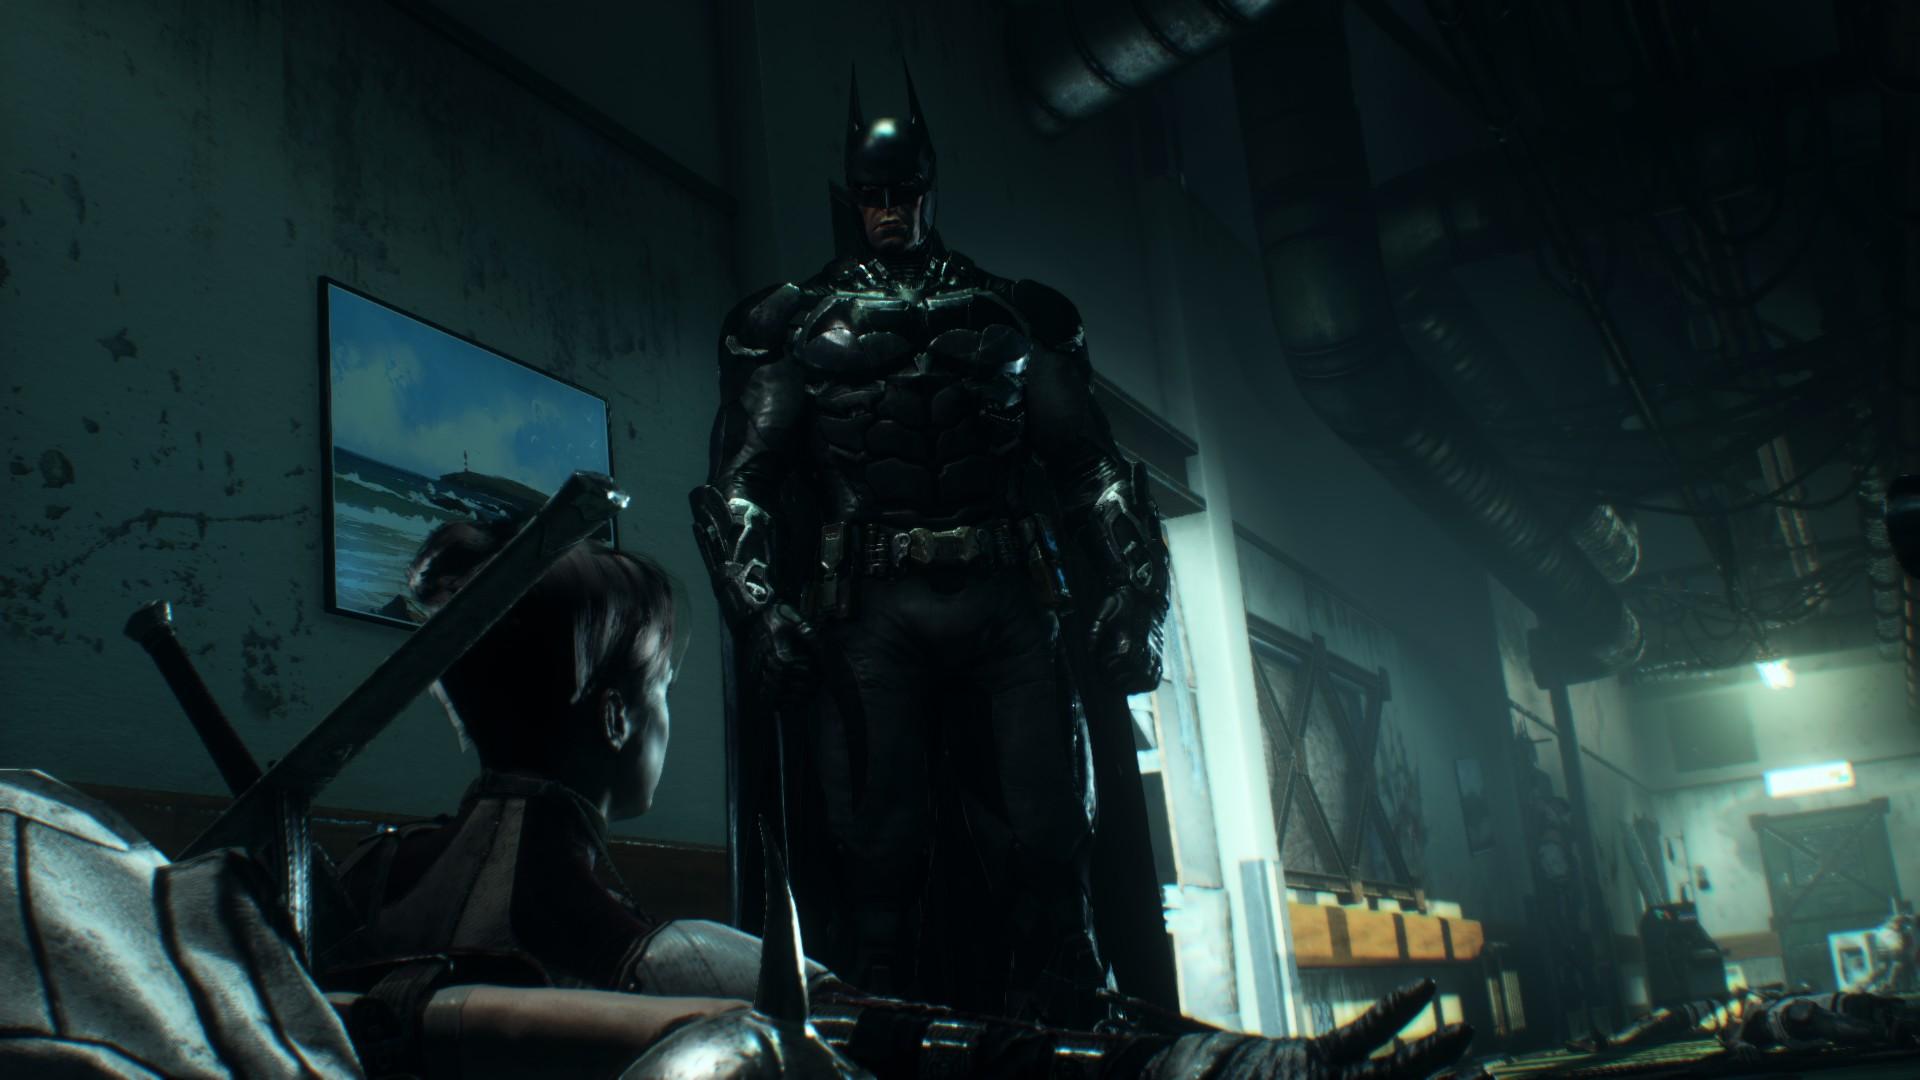 Batman: Arkham Knight - Stojí Season Pass za to? 11125